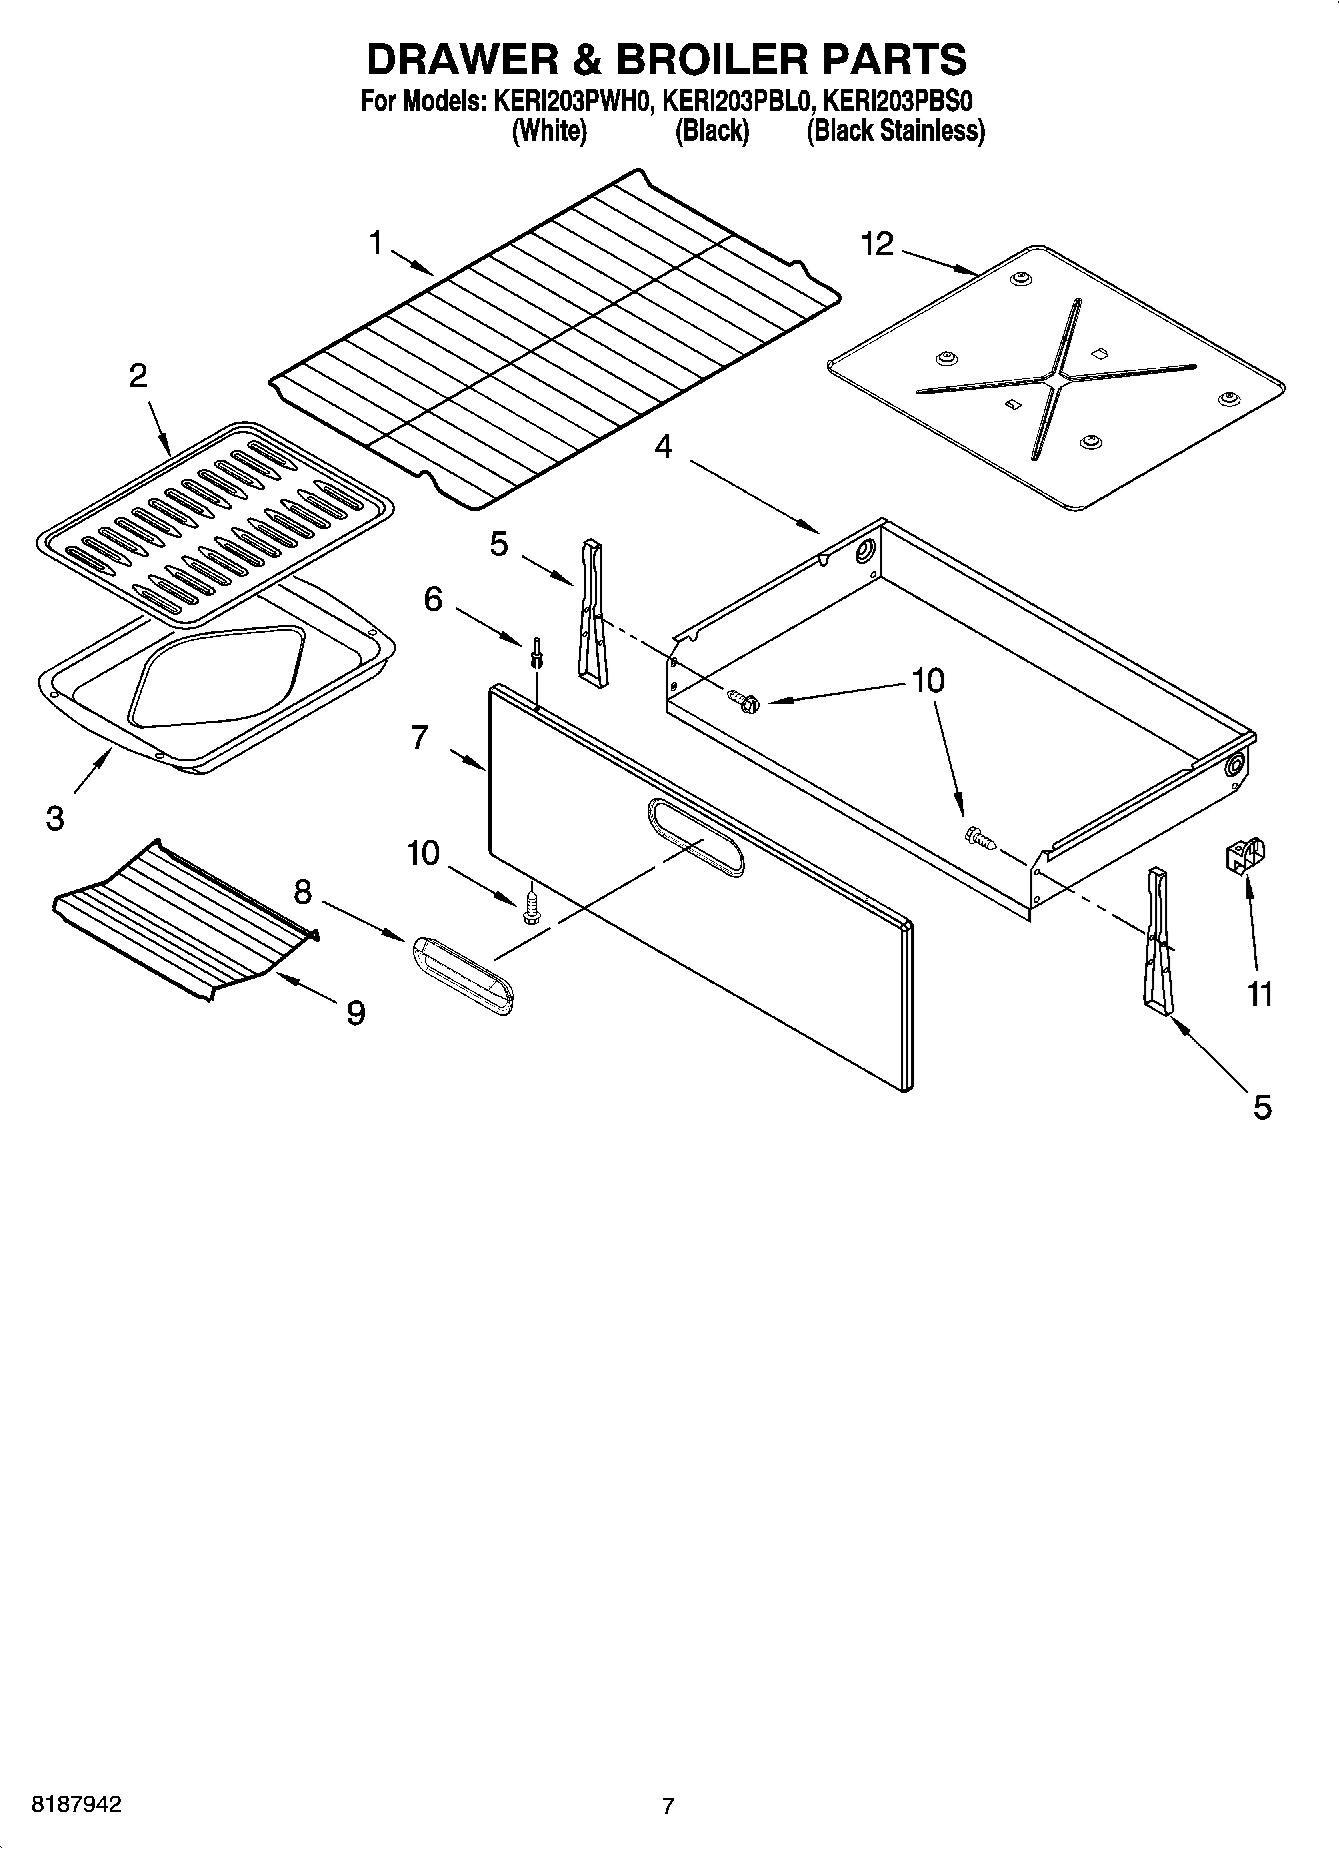 WhirlpoolImg_19000101 20150716_00108538?width\\\=1000 5krc49tn2235x wiring diagram 5krc49tn2235x wiring diagrams  at fashall.co